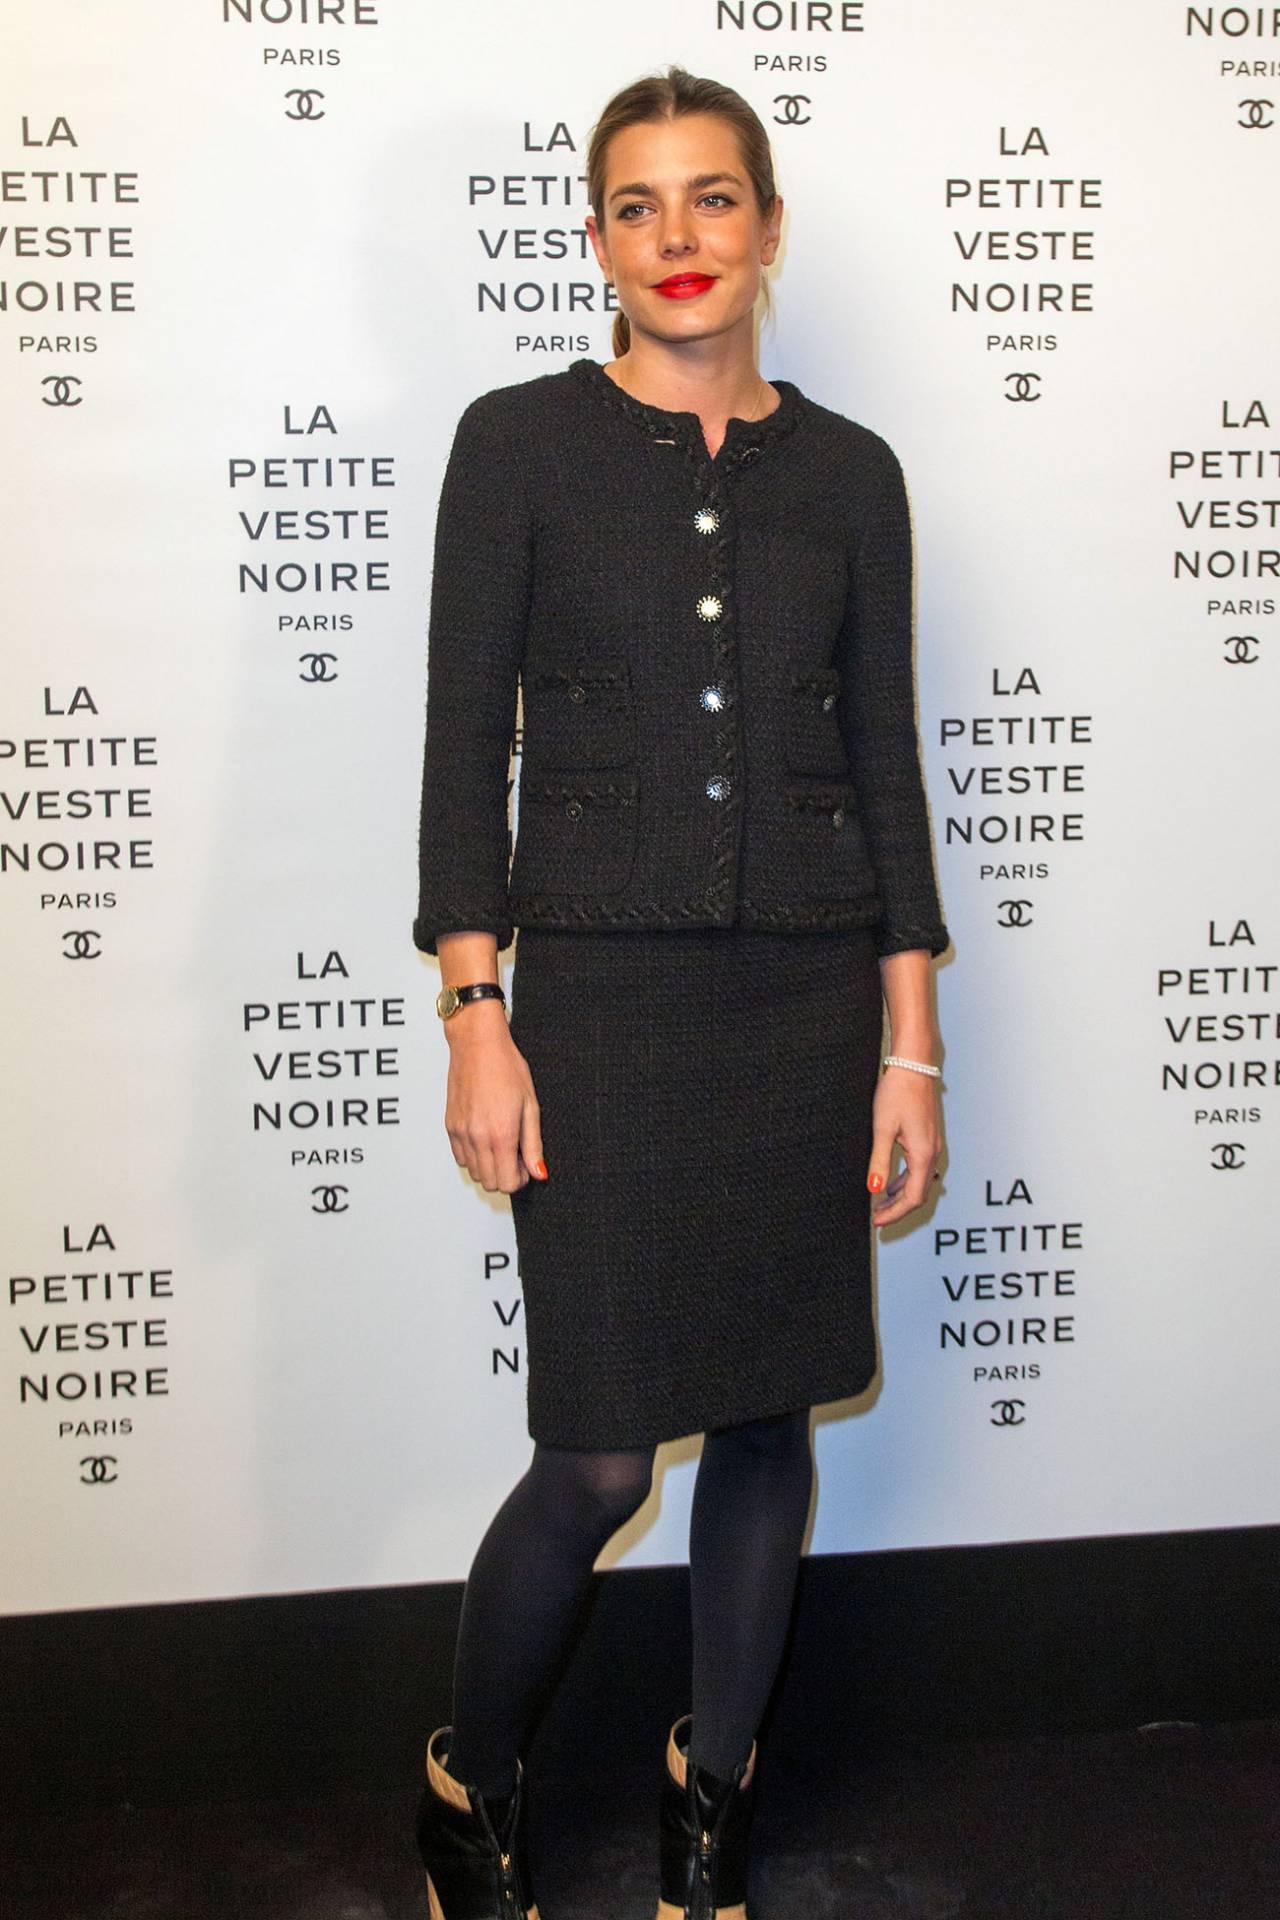 Chanel Chanel Fashion Chanel Campaign Chanel Ambassador 샤넬 샤넬패션 샤넬앰배서더 샤넬 리틀 블랙 재킷 샤넬 트위드 재킷 샬롯 카시라기 Charlotte Casiraghi